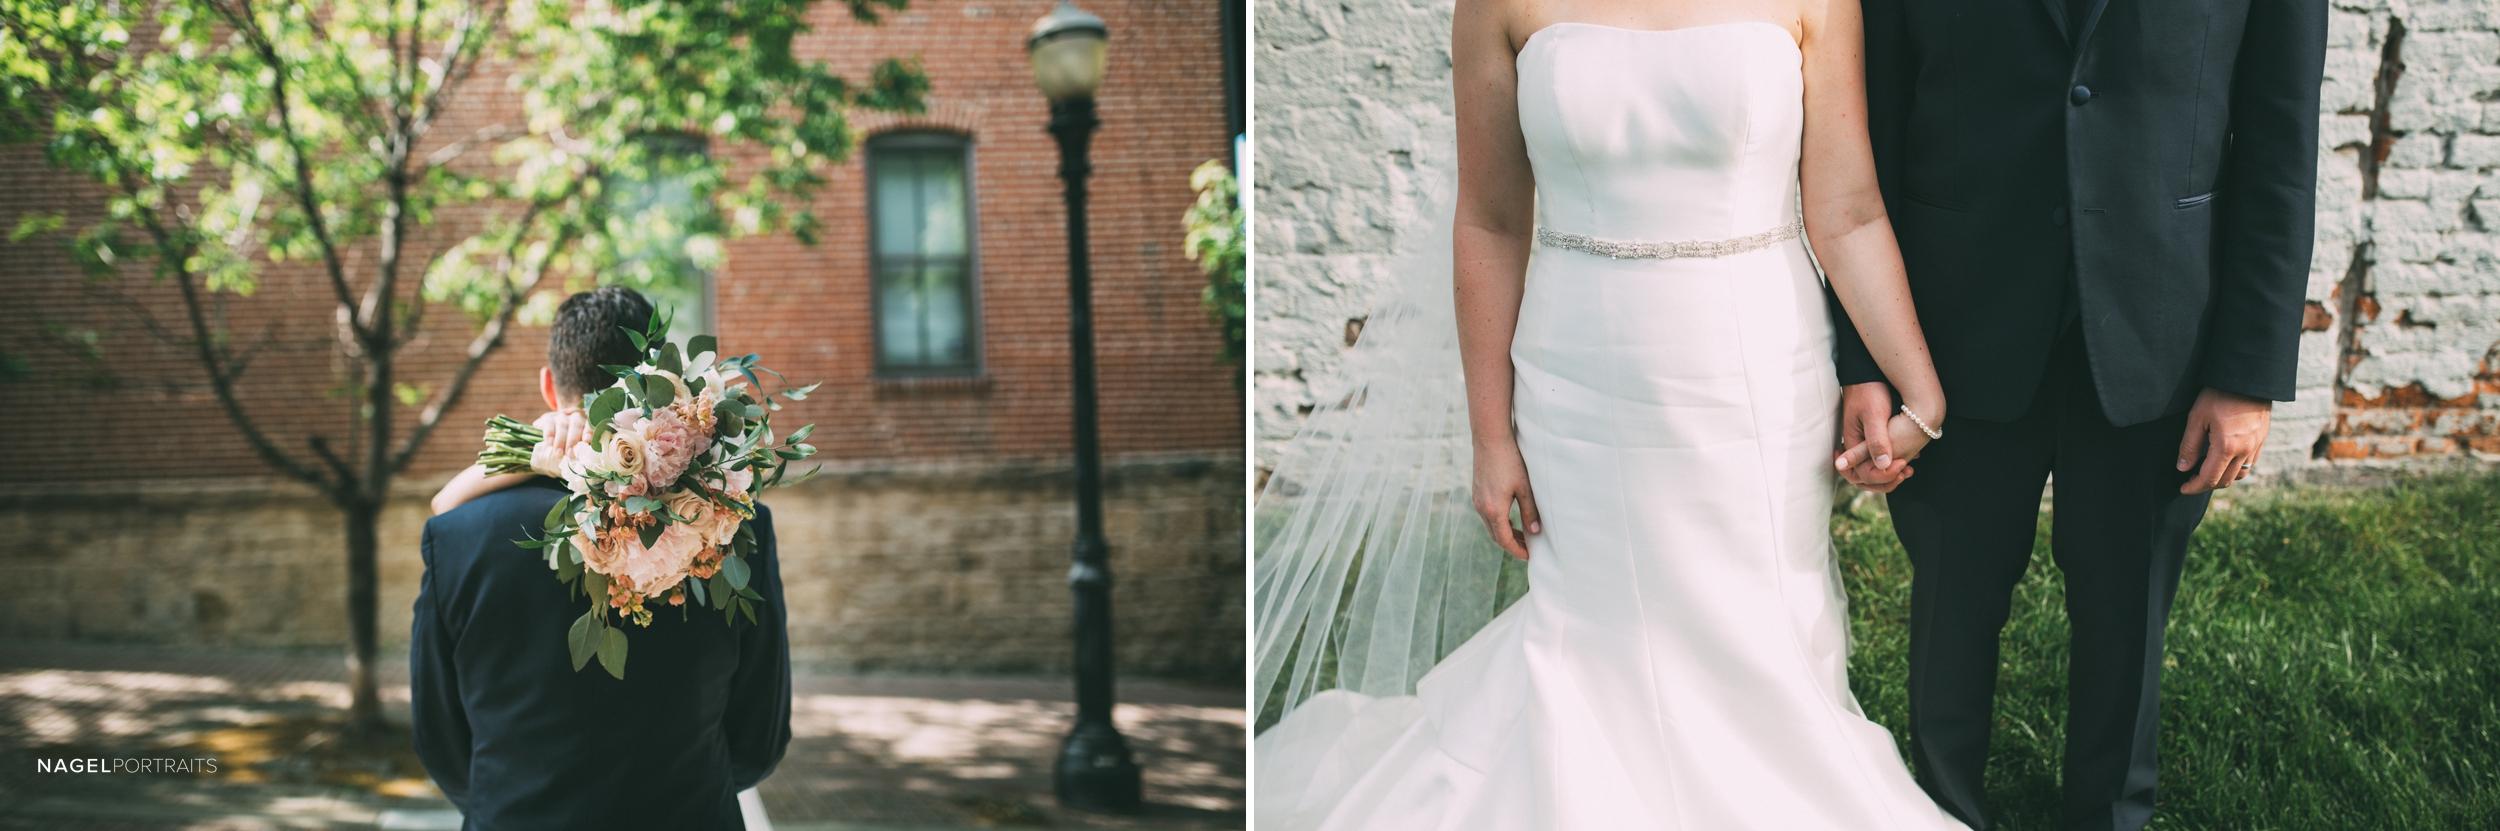 Wedding Blog 17.jpg